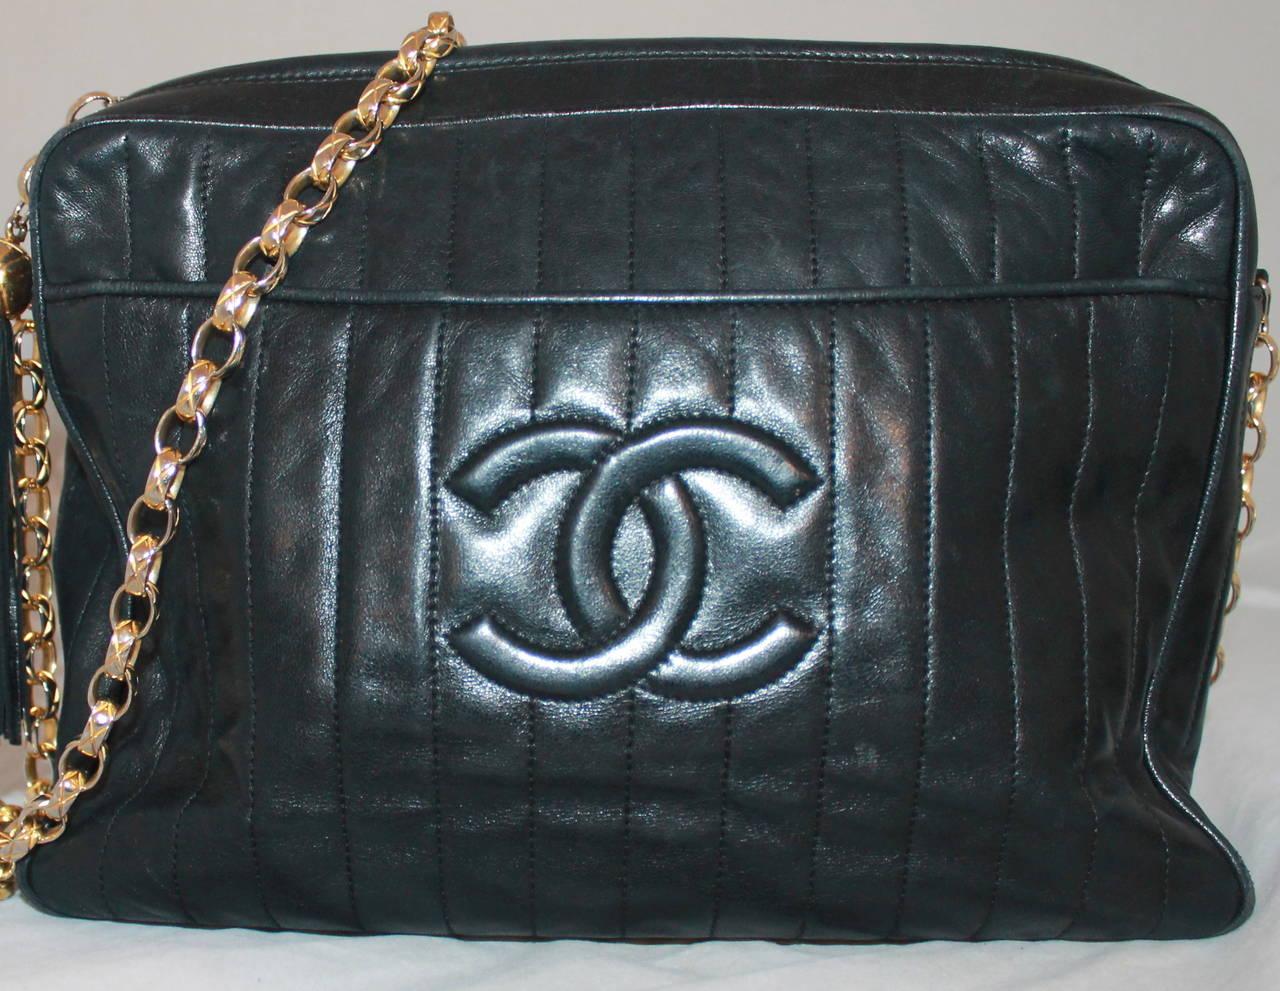 Chanel Vintage Black Lambskin Handbag with Tassle - circa 1990s 3